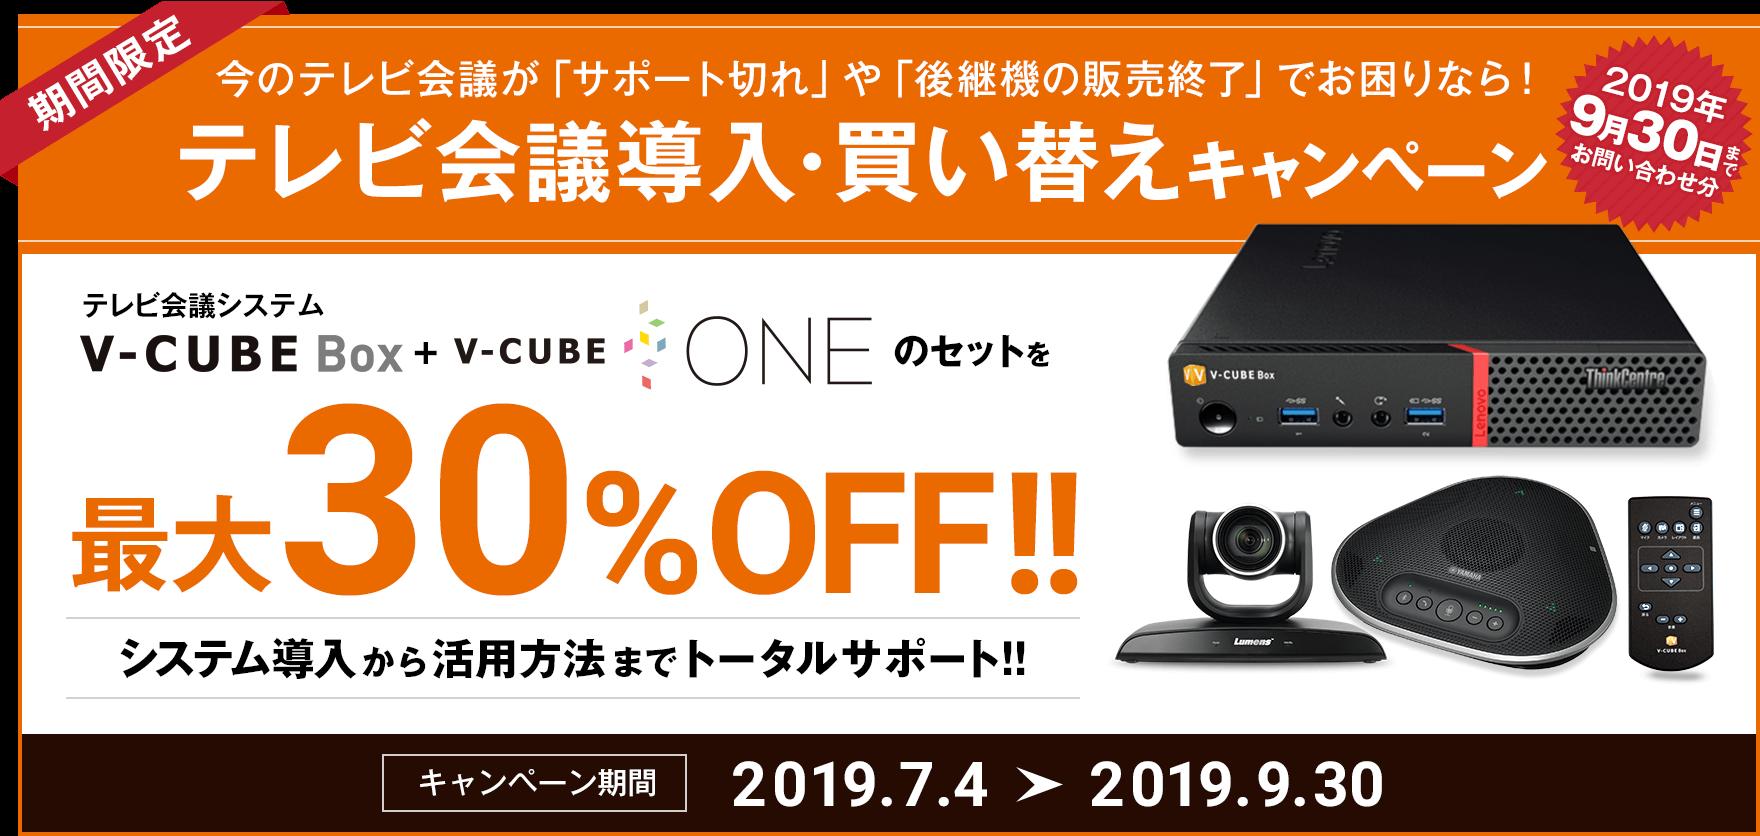 「V-CUBE Box」「V-CUBE One」最大30%OFF!